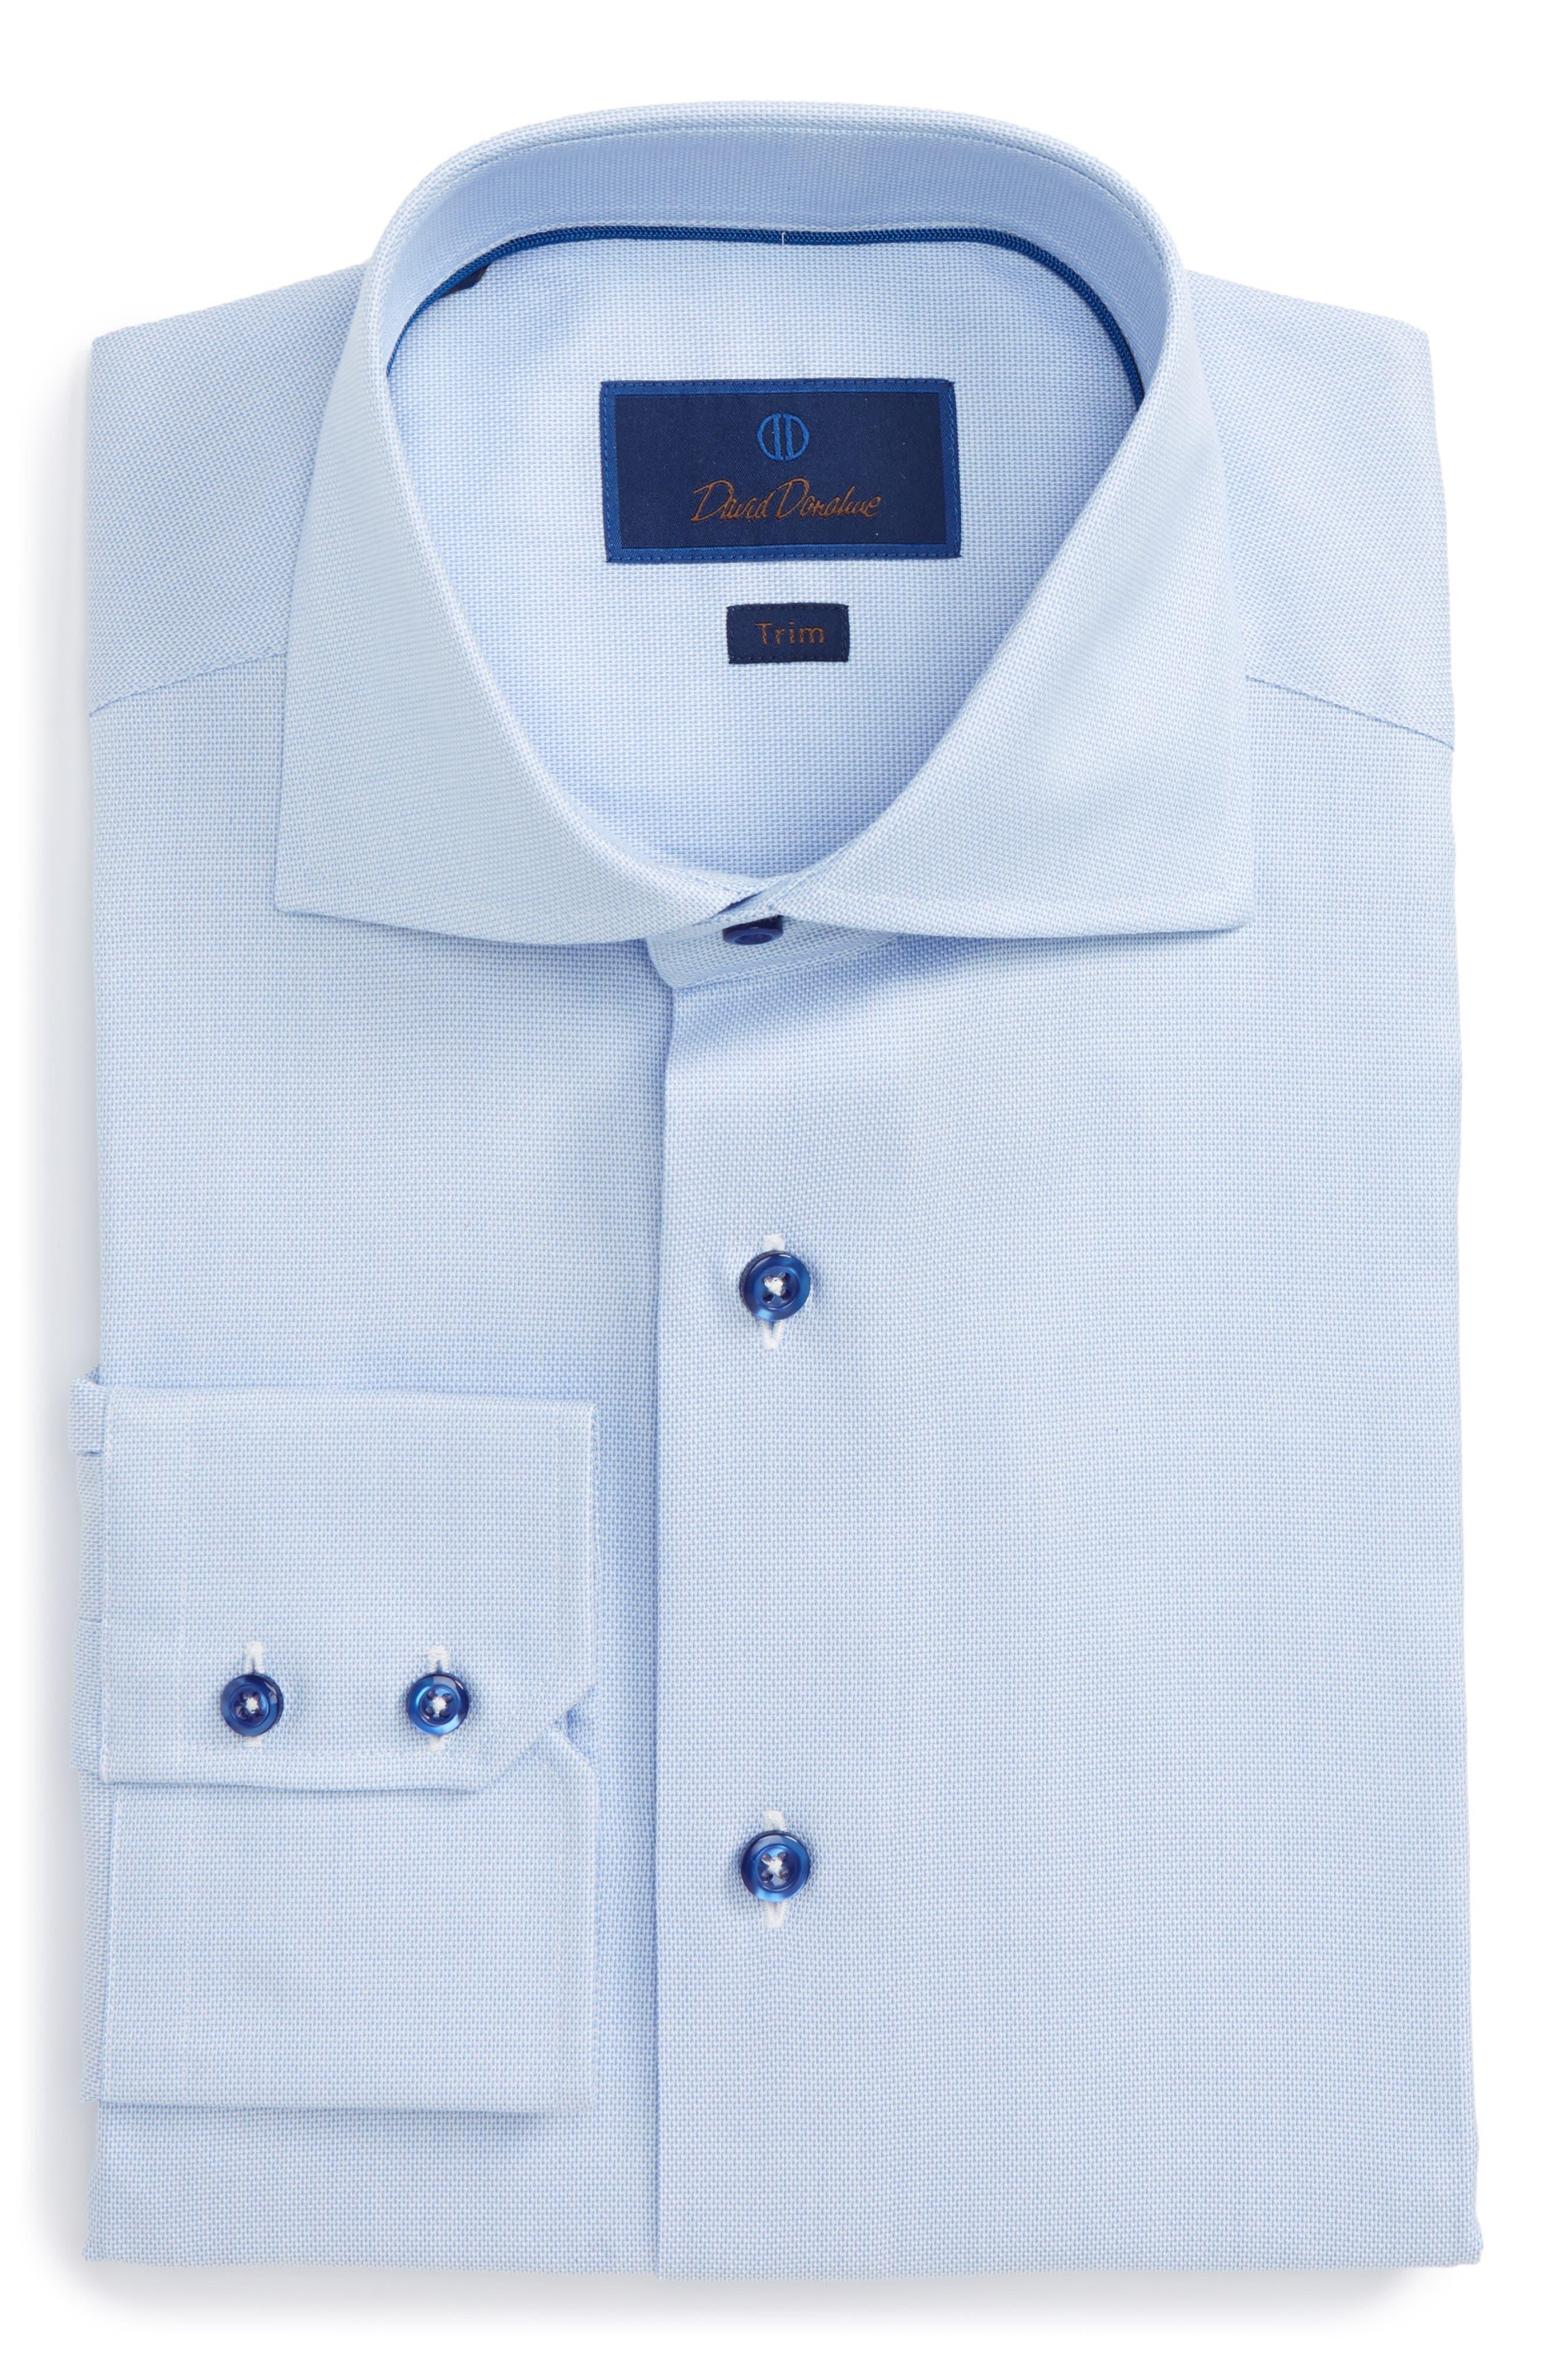 Alternate Image 1 Selected - David Donahue Trim Fit Solid Dress Shirt